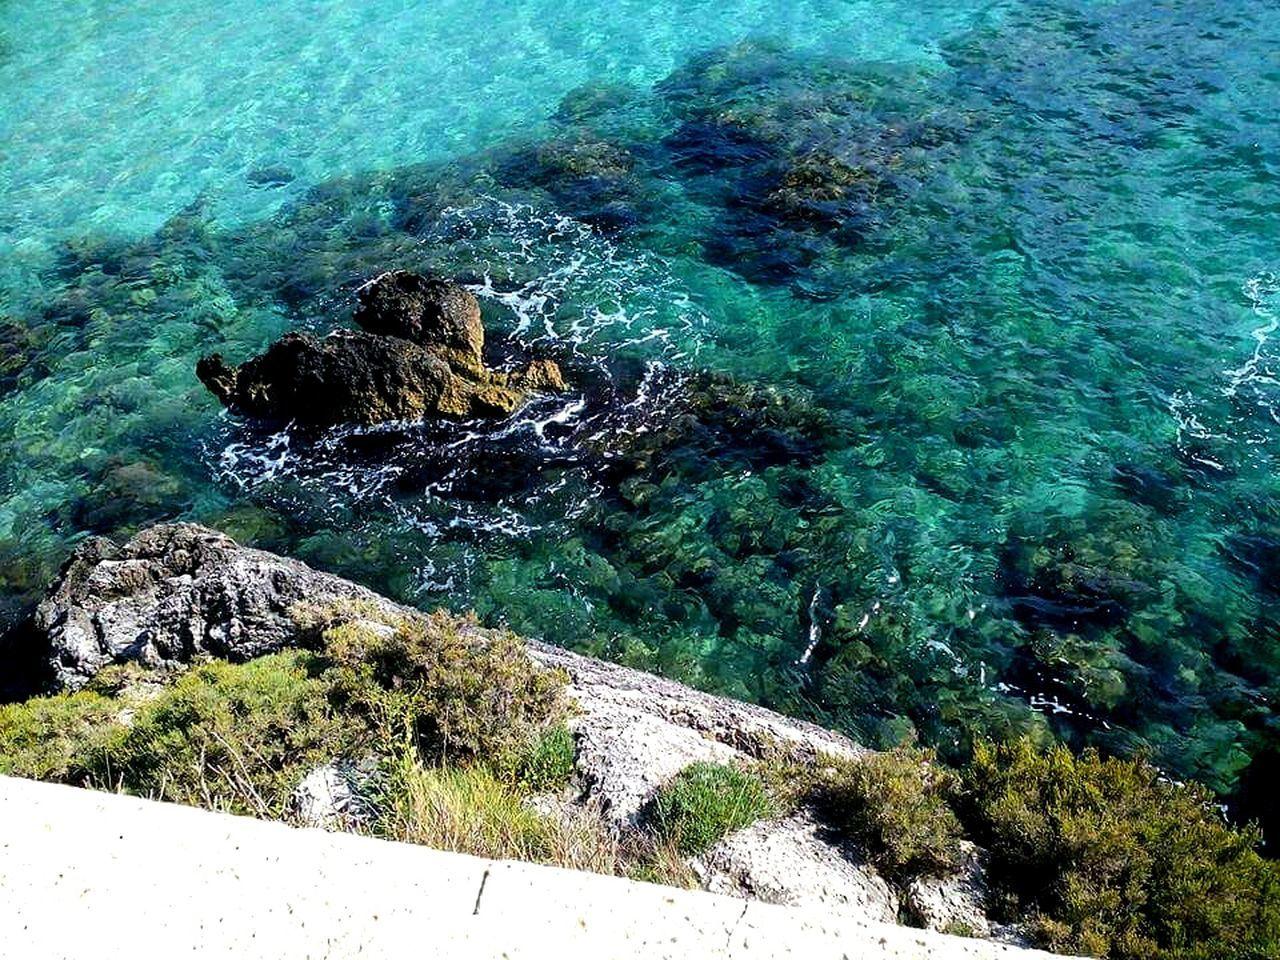 Sea Sea Stones Green Sea Day No People Nature Outdoors Water Sunlight Nature Sea Plant